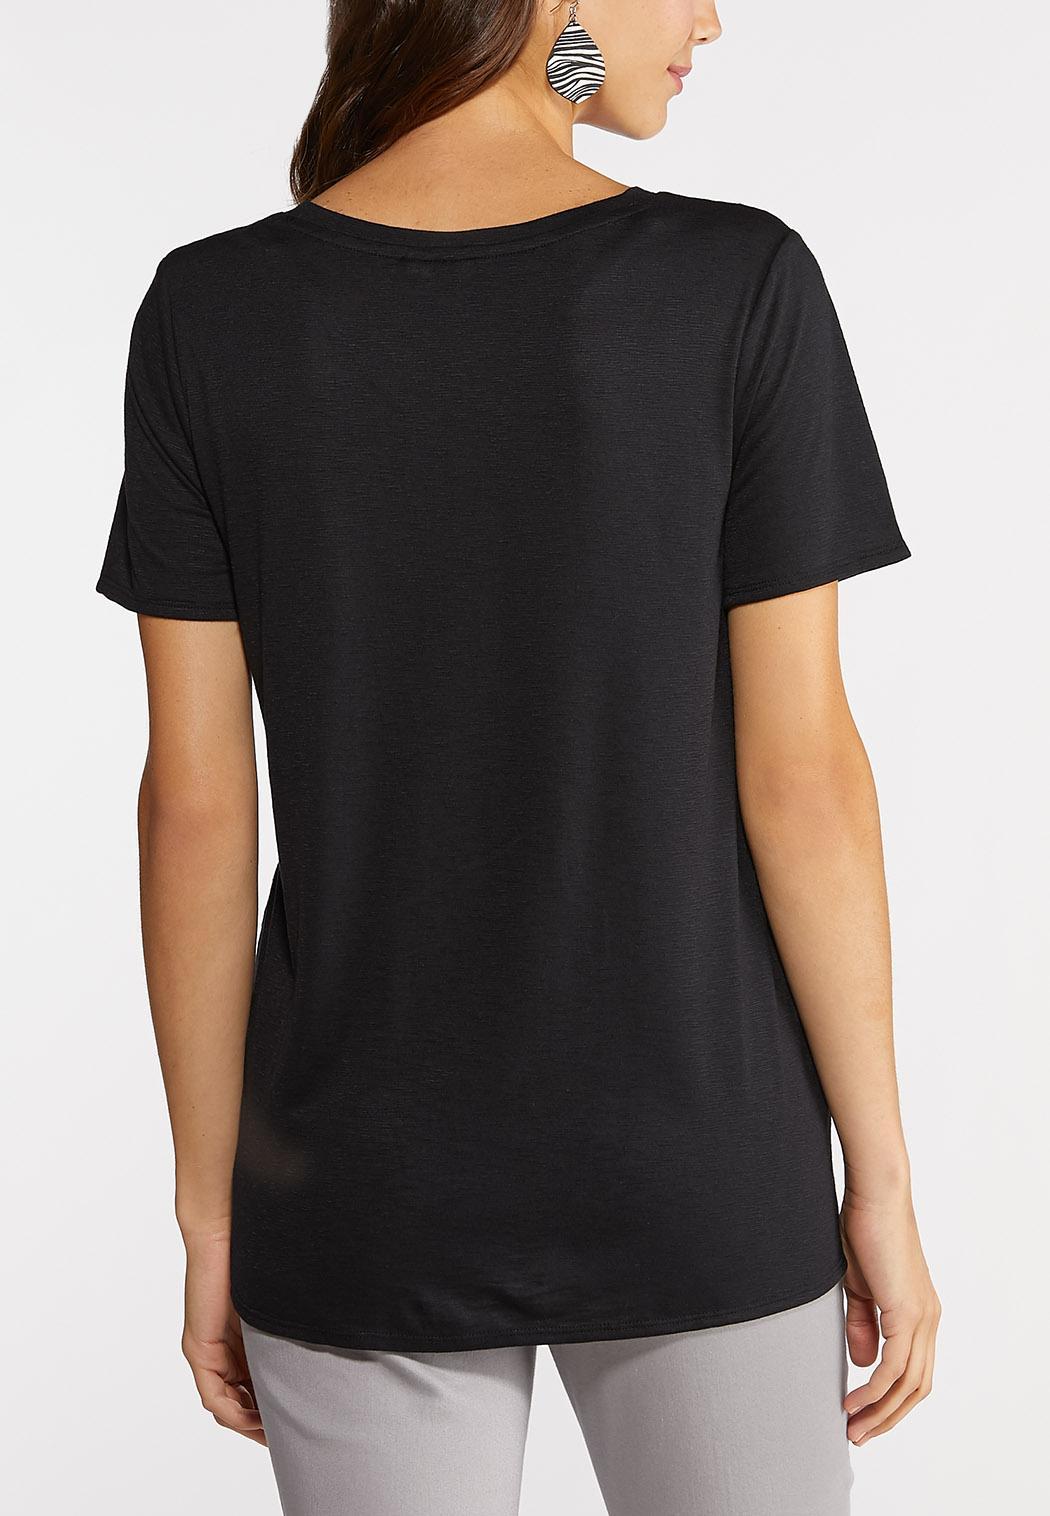 Plus Size Tie Front V-Neck Tee (Item #43904706)